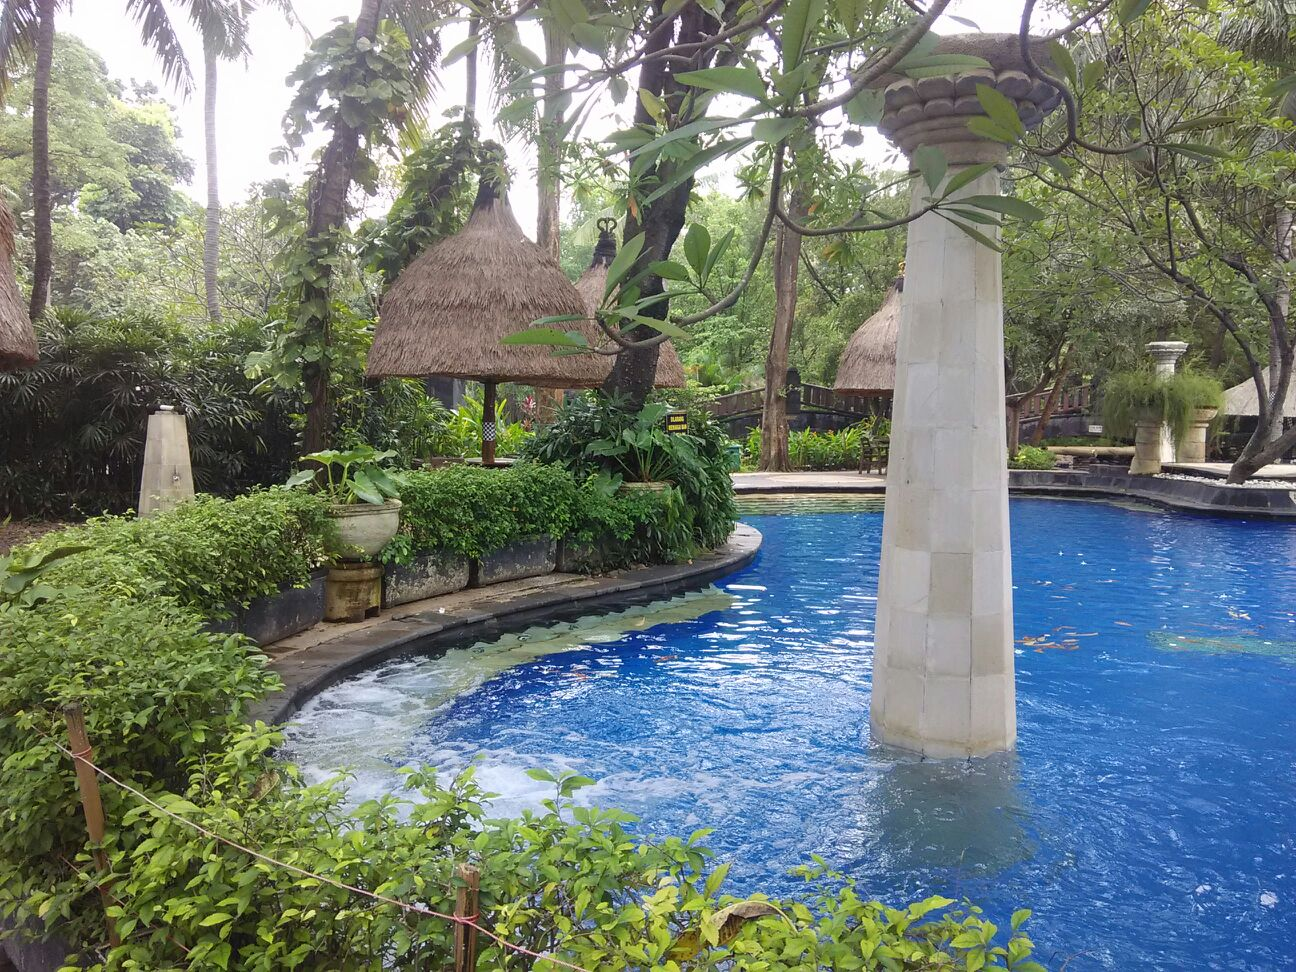 Pictures Of Waterboom Cikarang Outbond Voucher Water Boom Lippo Pesona Bali Di Jawa